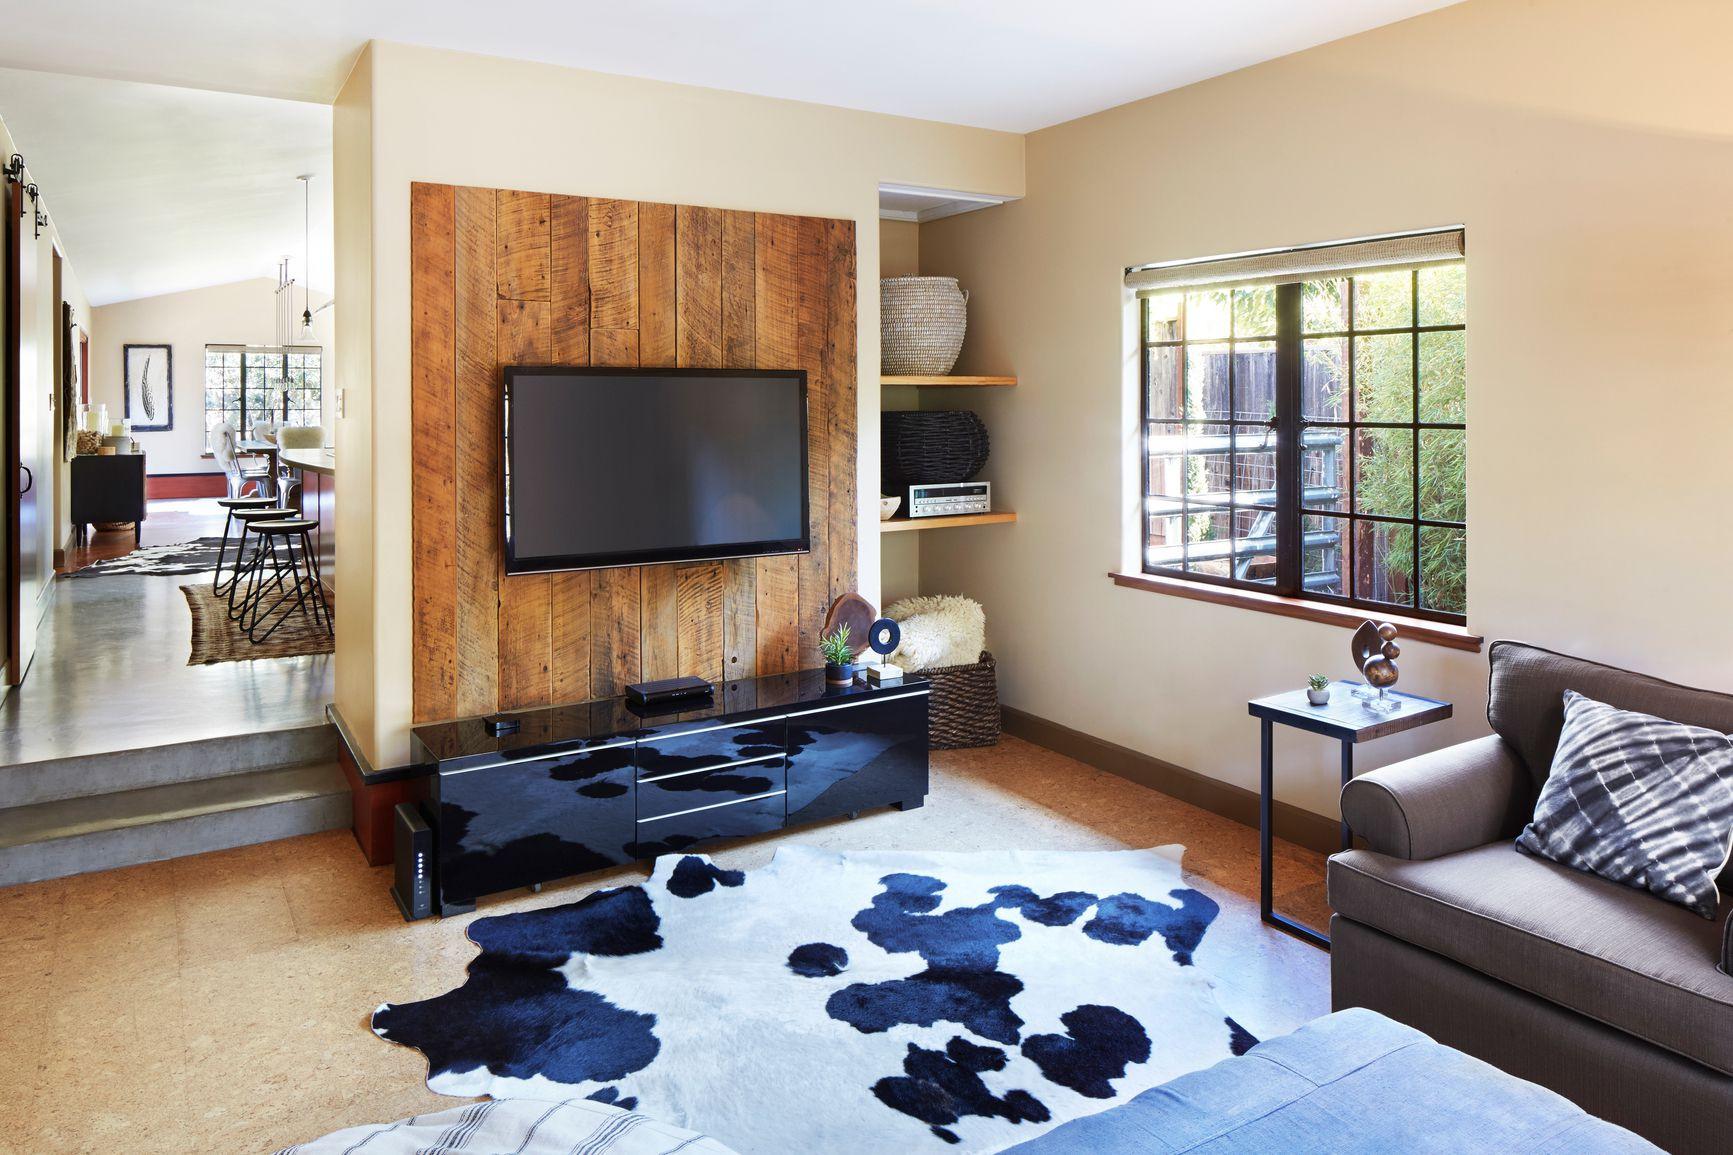 asu 15 hardwood flooring underlayment felt paper of drywall alternatives unique wall coverings throughout stocksy txp6d0c504b95p100 medium 1662581 5a6f81ef8023b900372d1b4f